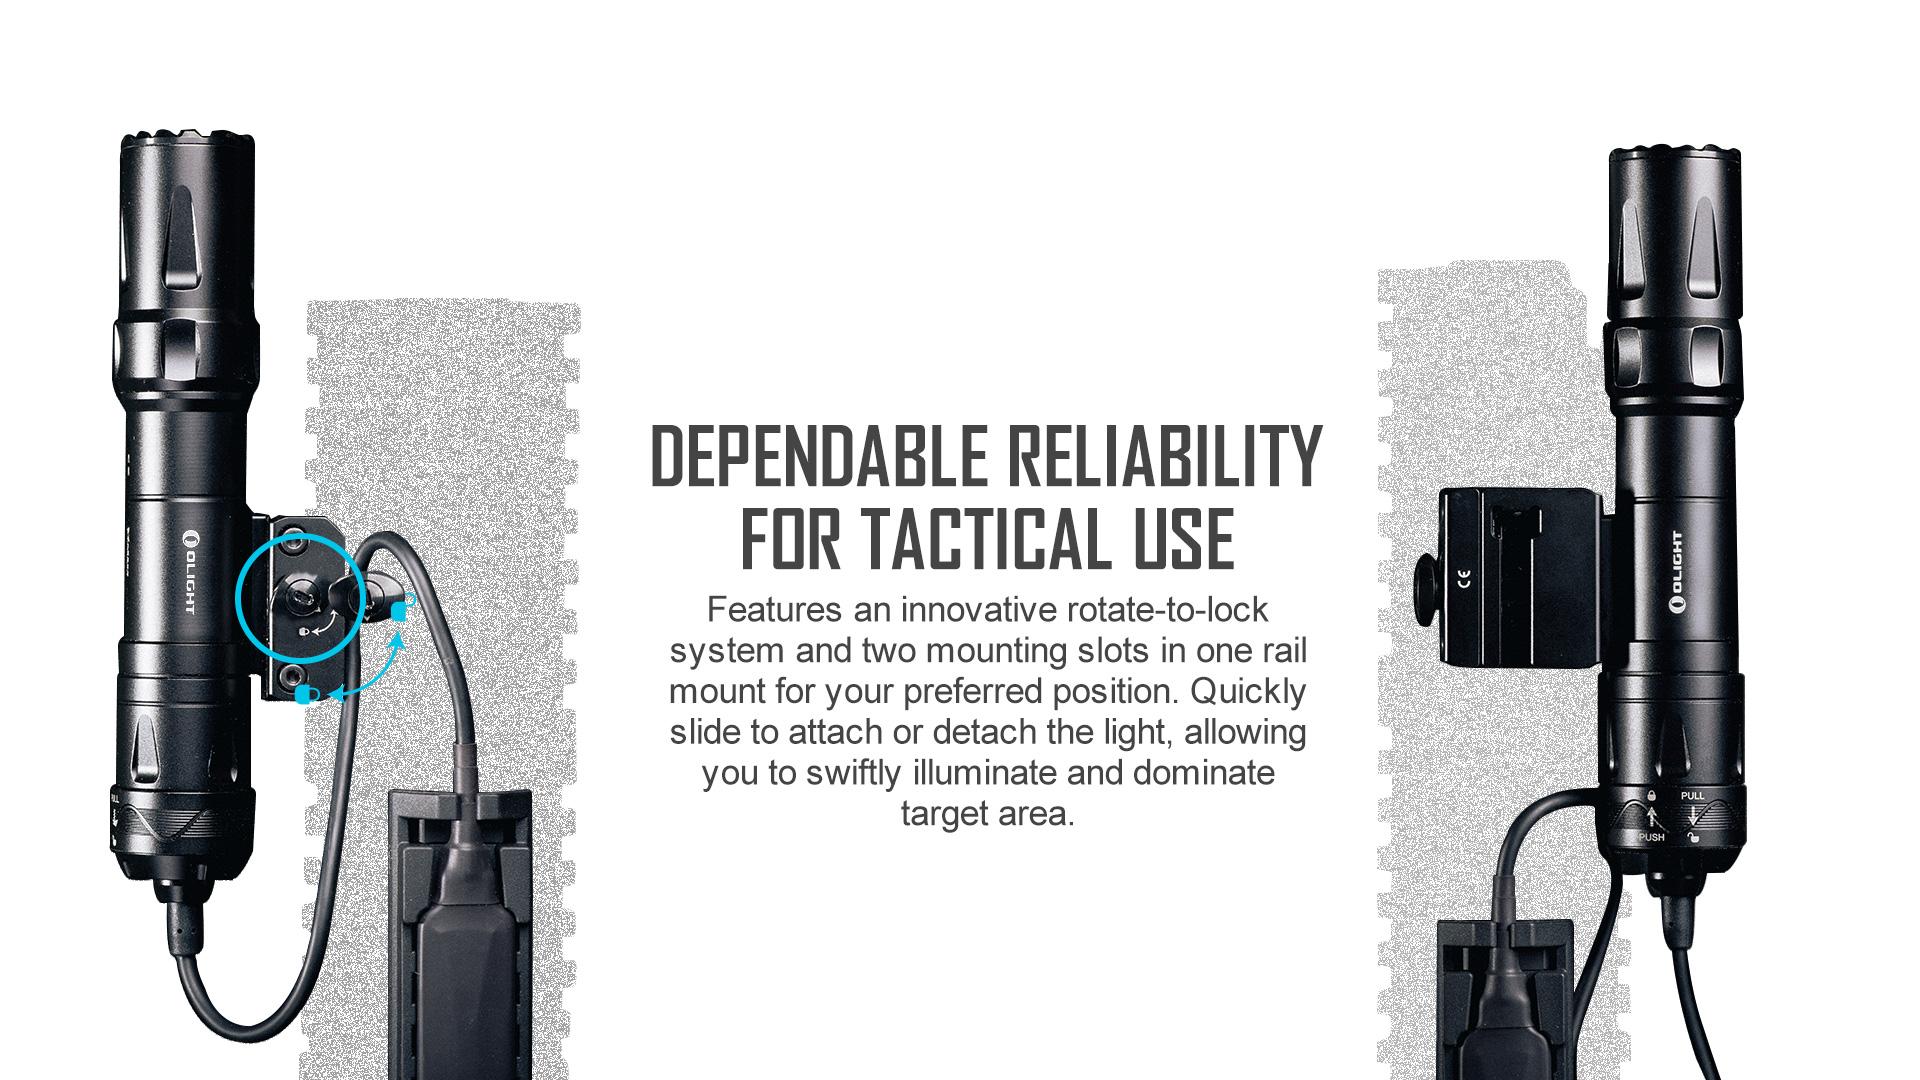 Odin Military Flashlight Reliable slide rail mount